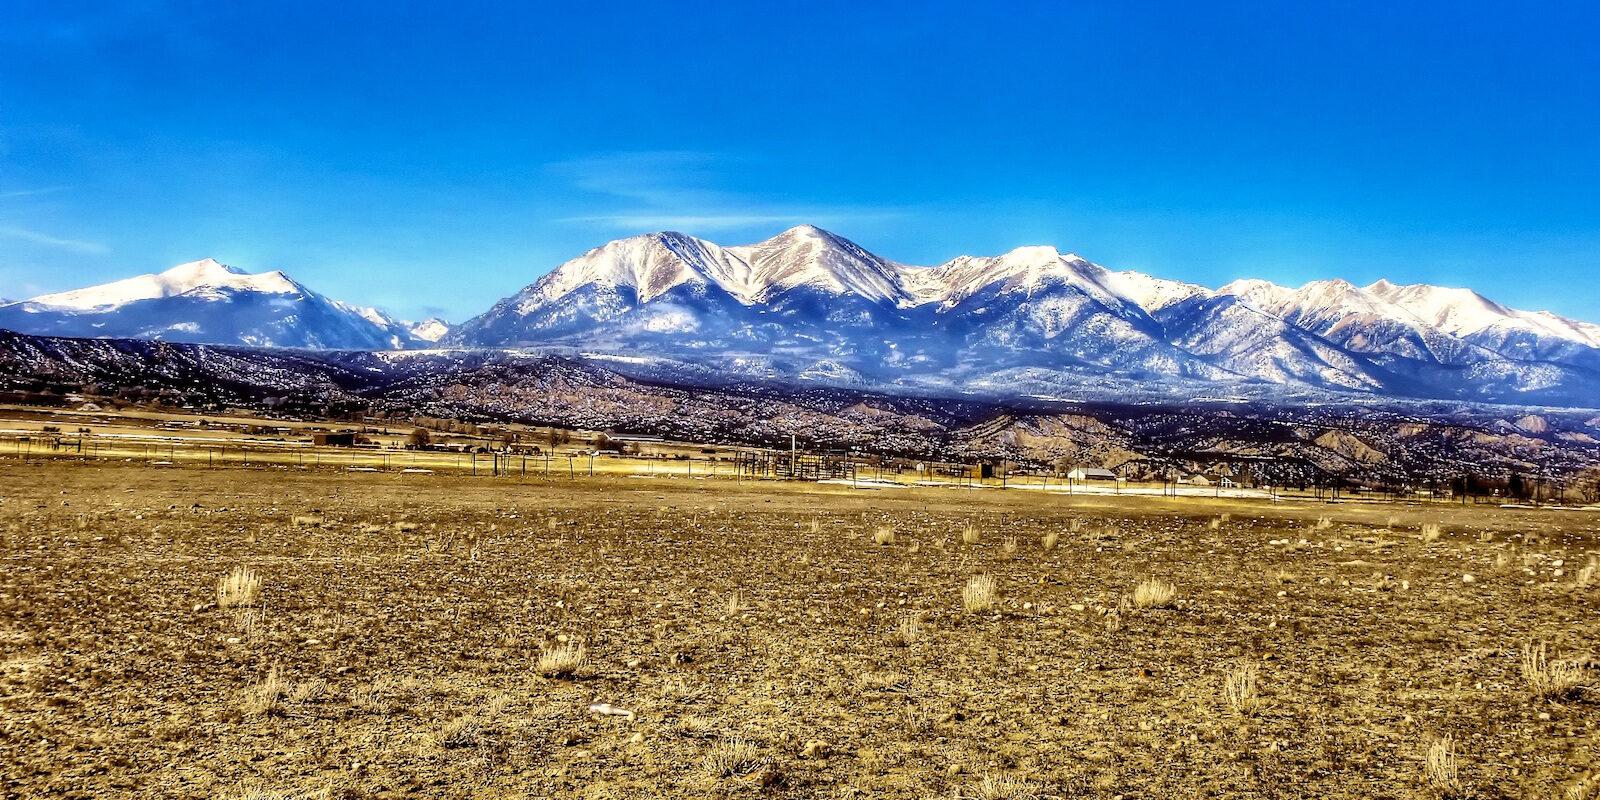 Sawatch Range Tabeguache Peak, Mount Shavano and Mount Antero